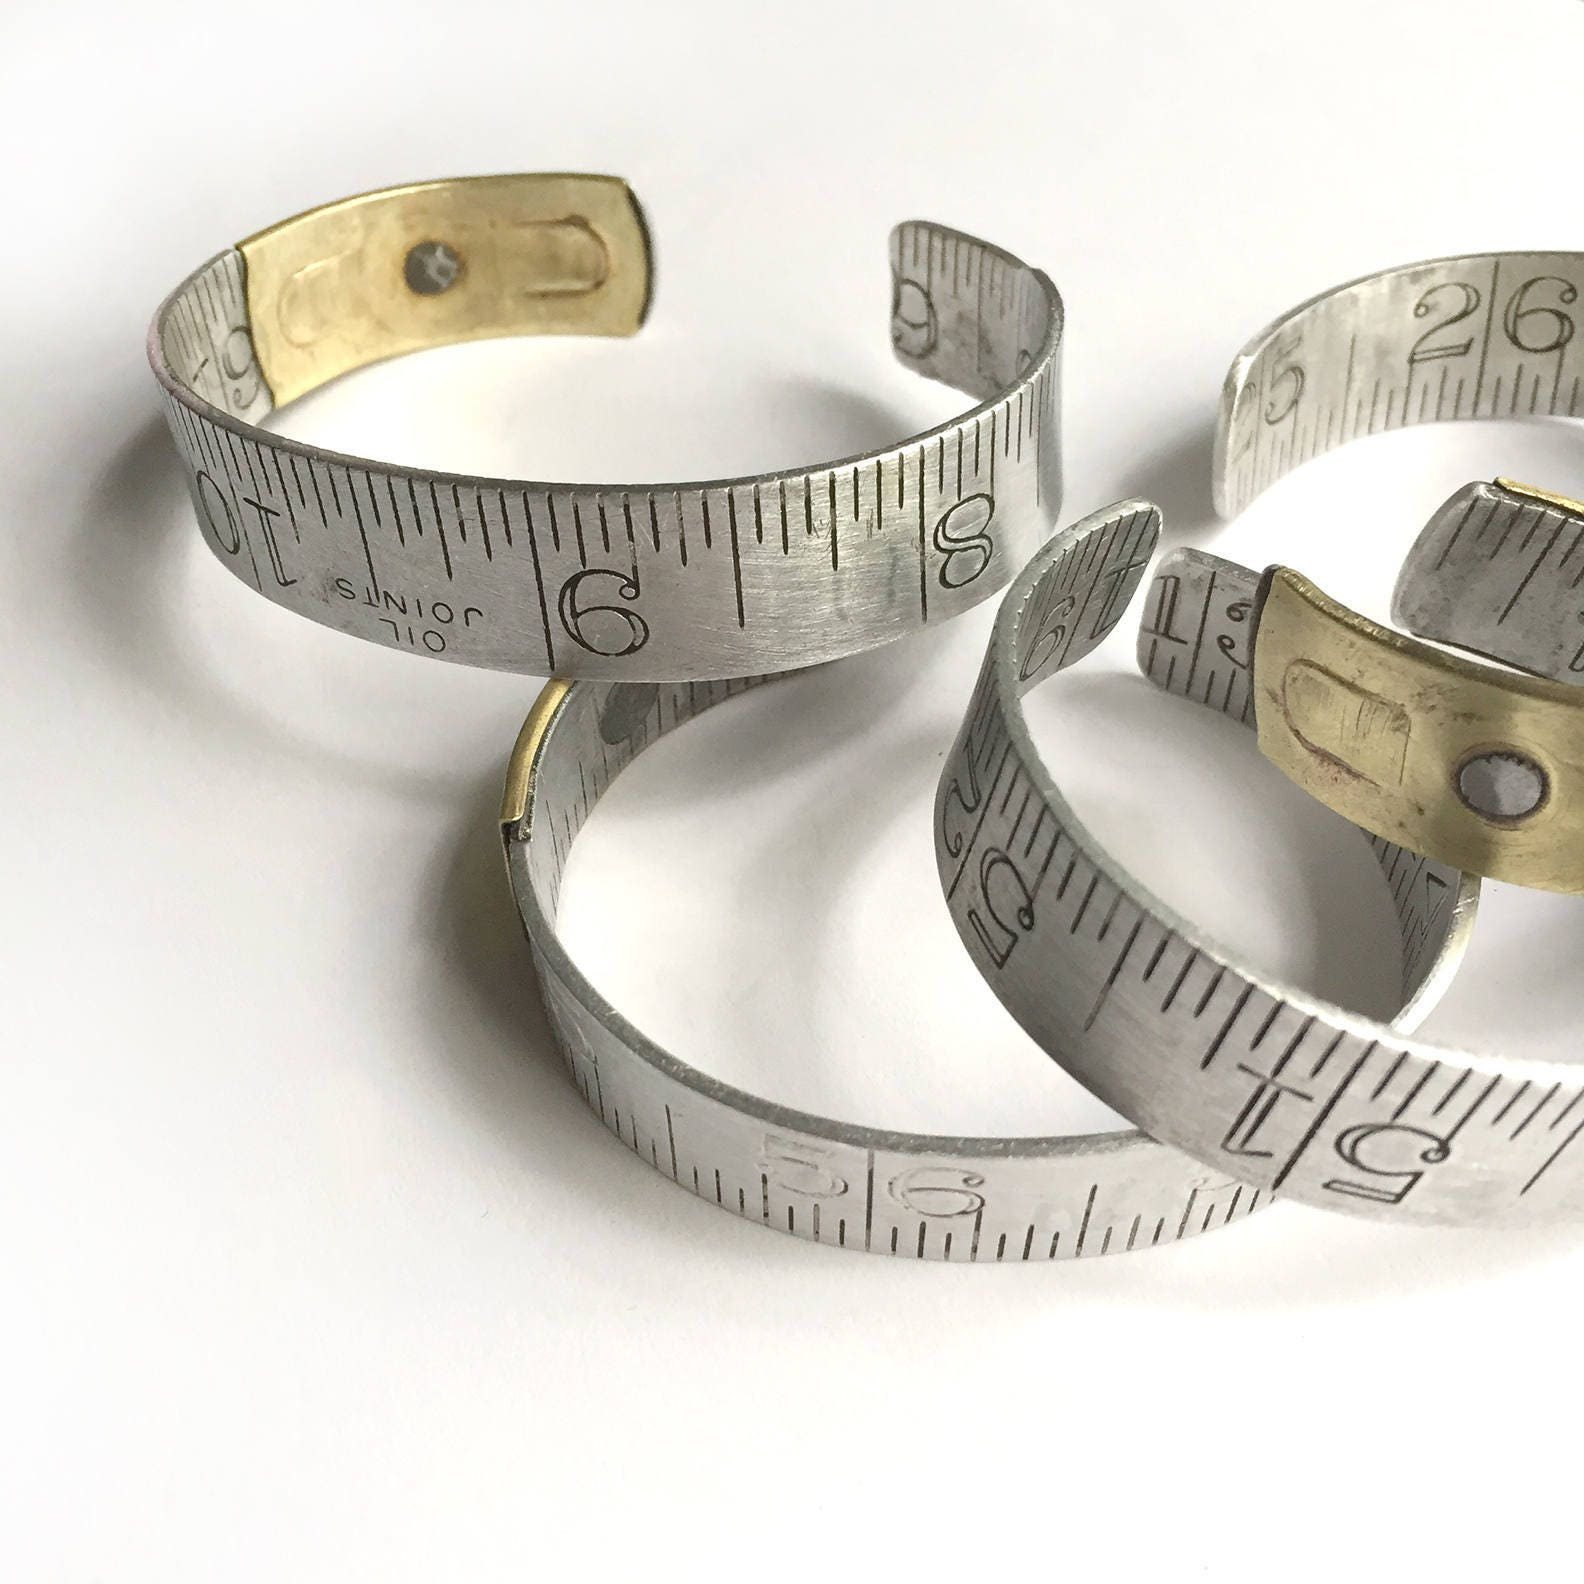 de taille moyenne r gle bracelet vintage en aluminium. Black Bedroom Furniture Sets. Home Design Ideas